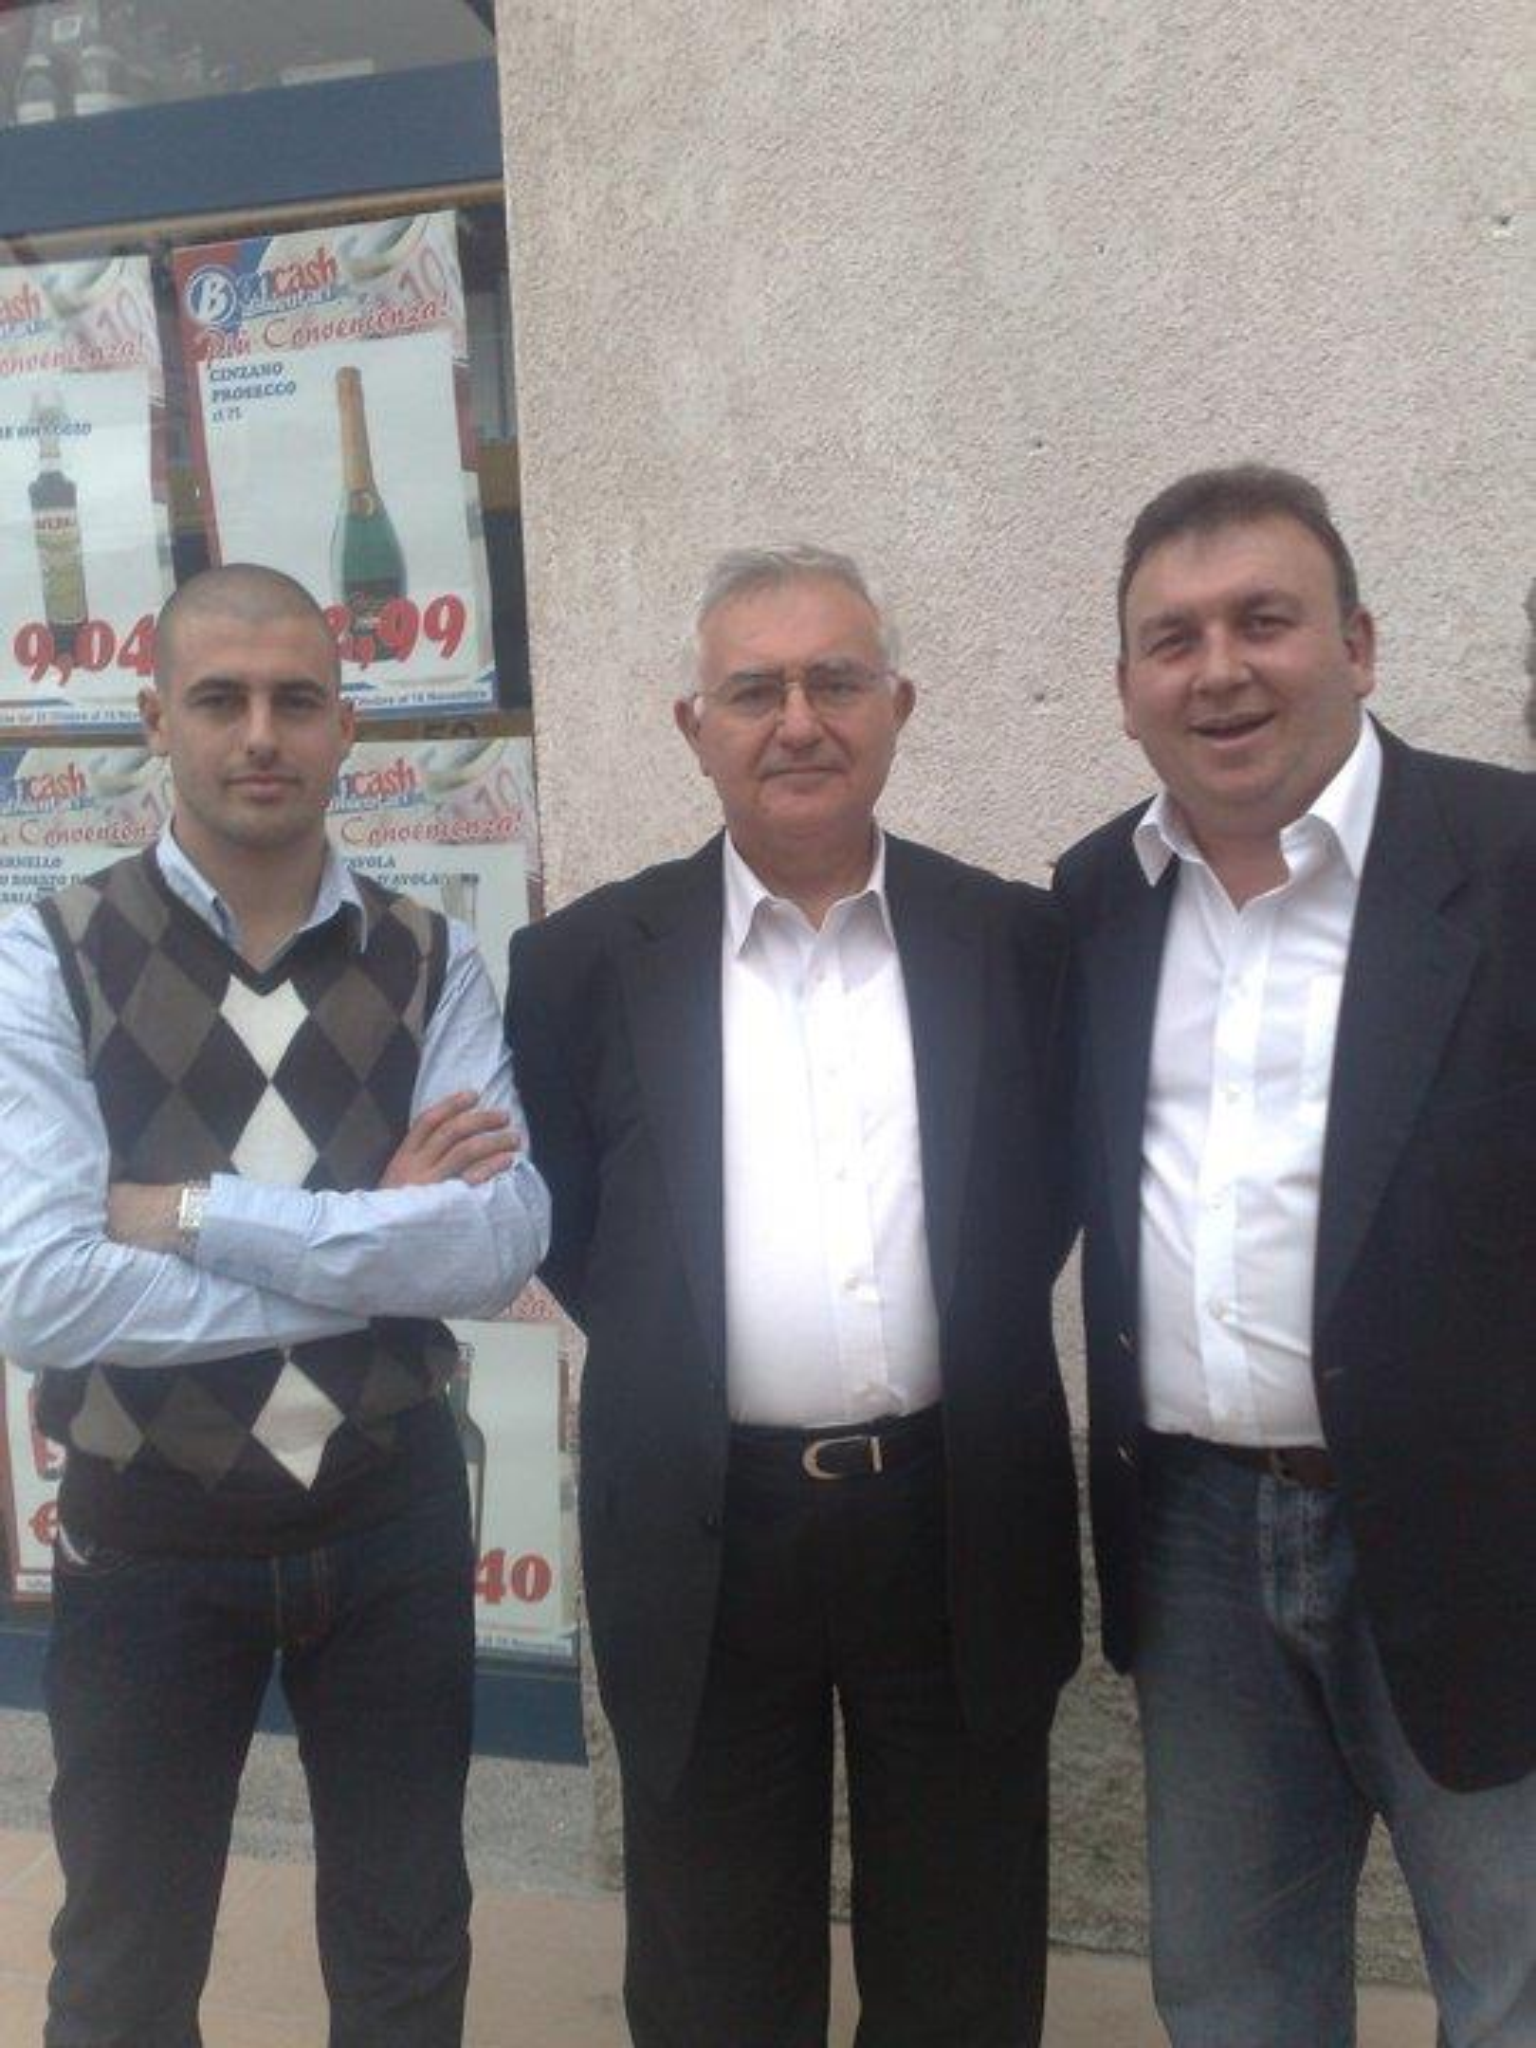 John Dalli on holiday in Italy with Iosif Galea and Silvio Zammit